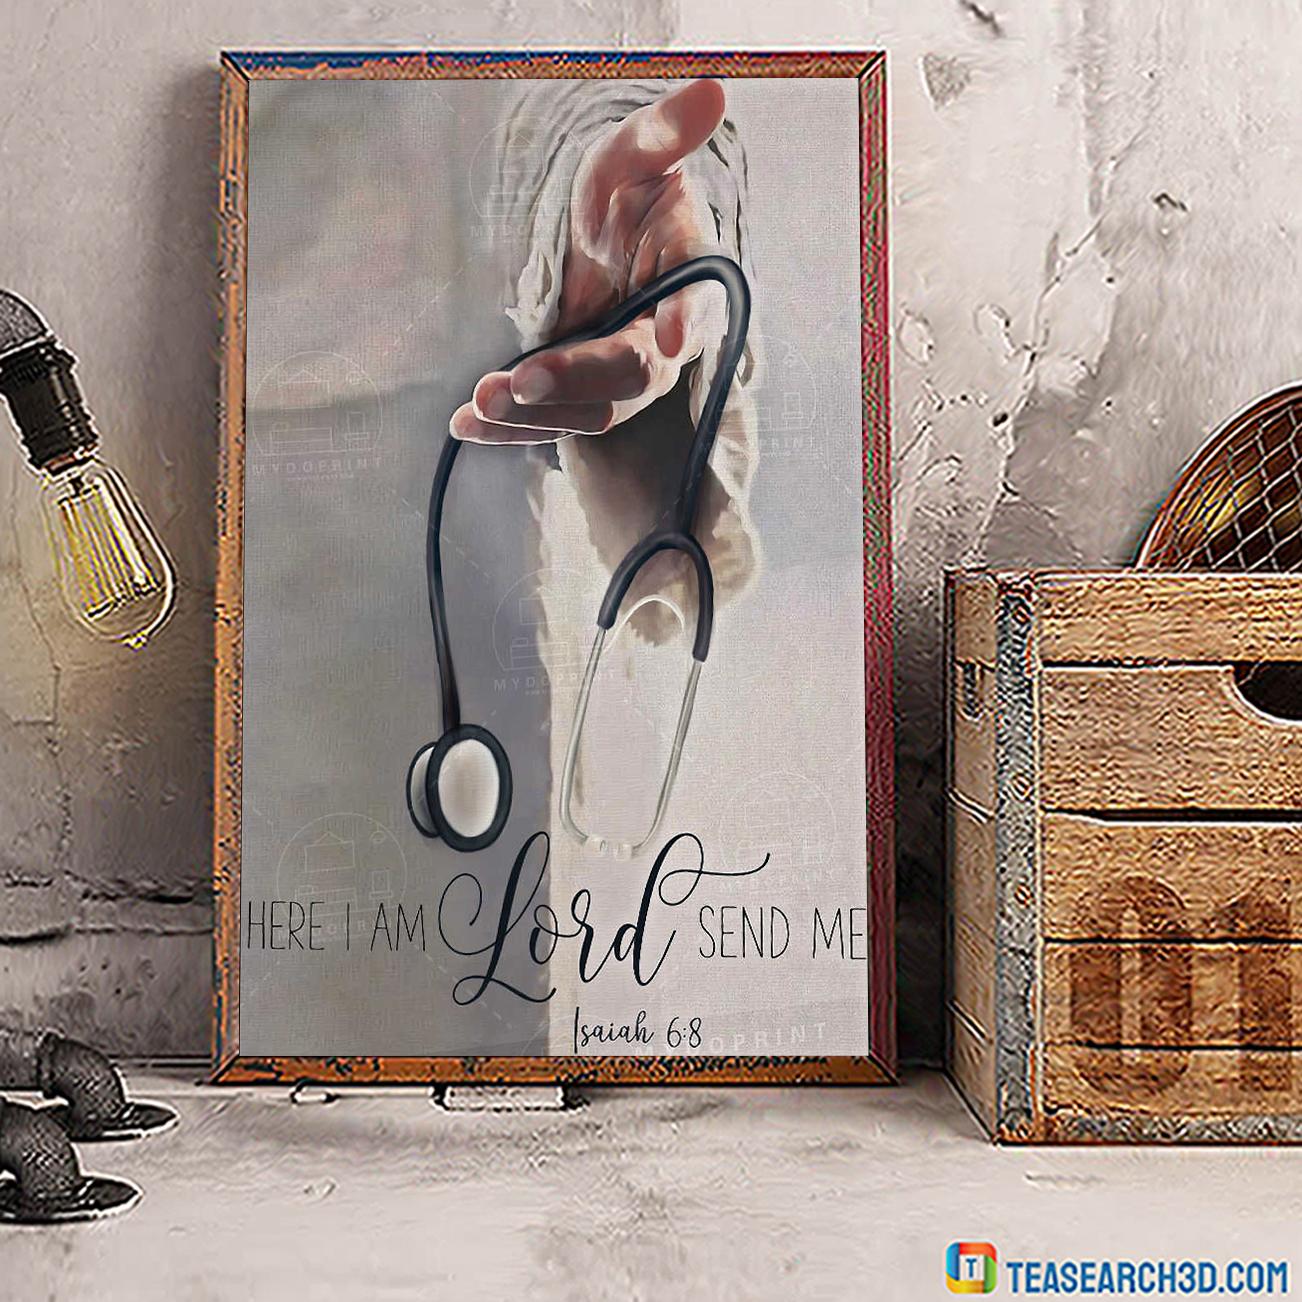 Jesus god's hand nurse here I am lord send me poster A1